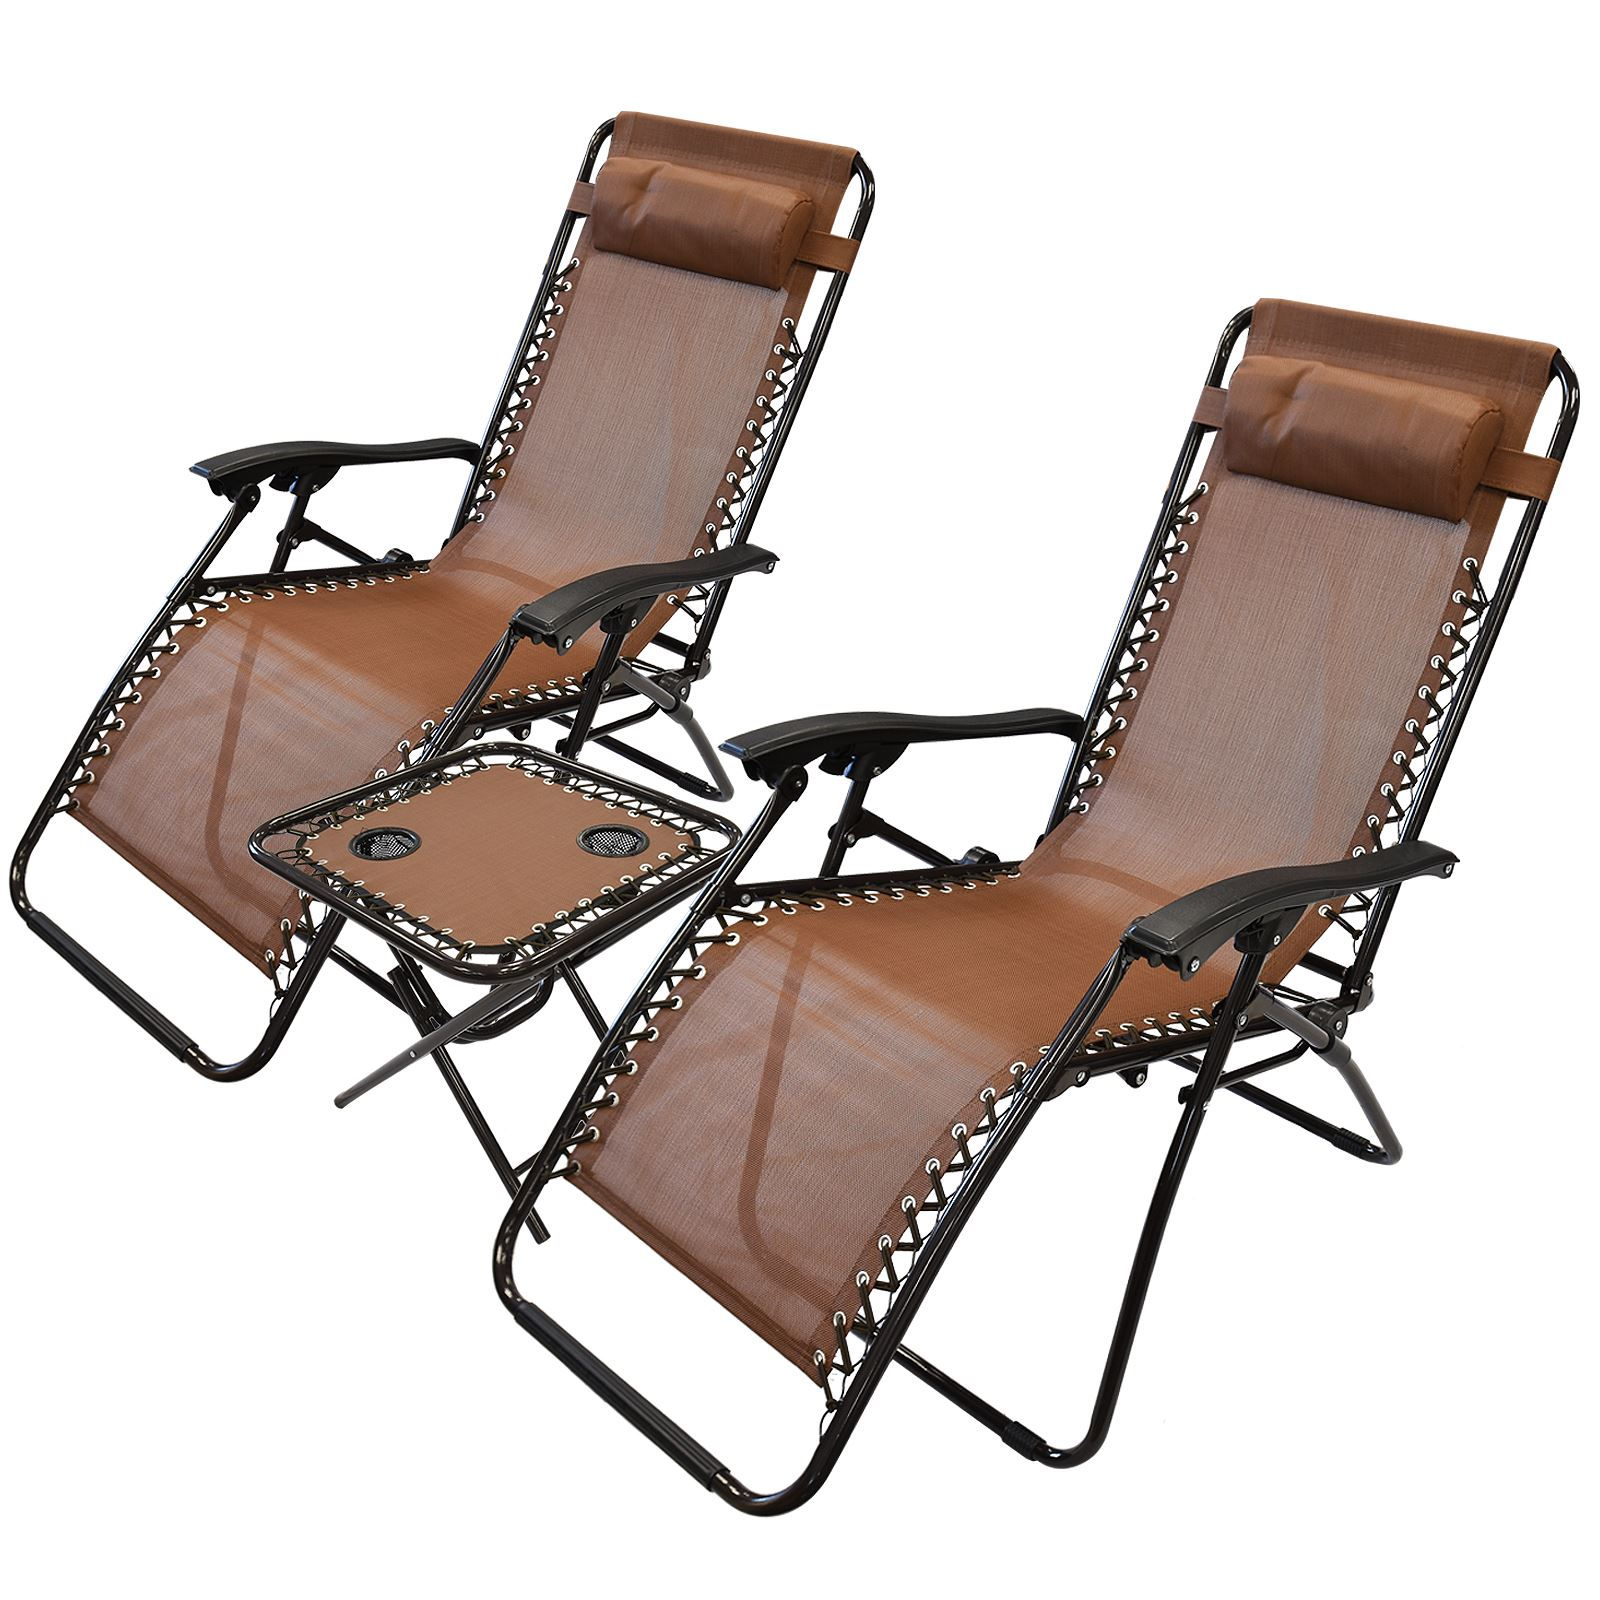 3pc folding table reclining sun lounger chair textoline for Chaise longue transat pliante